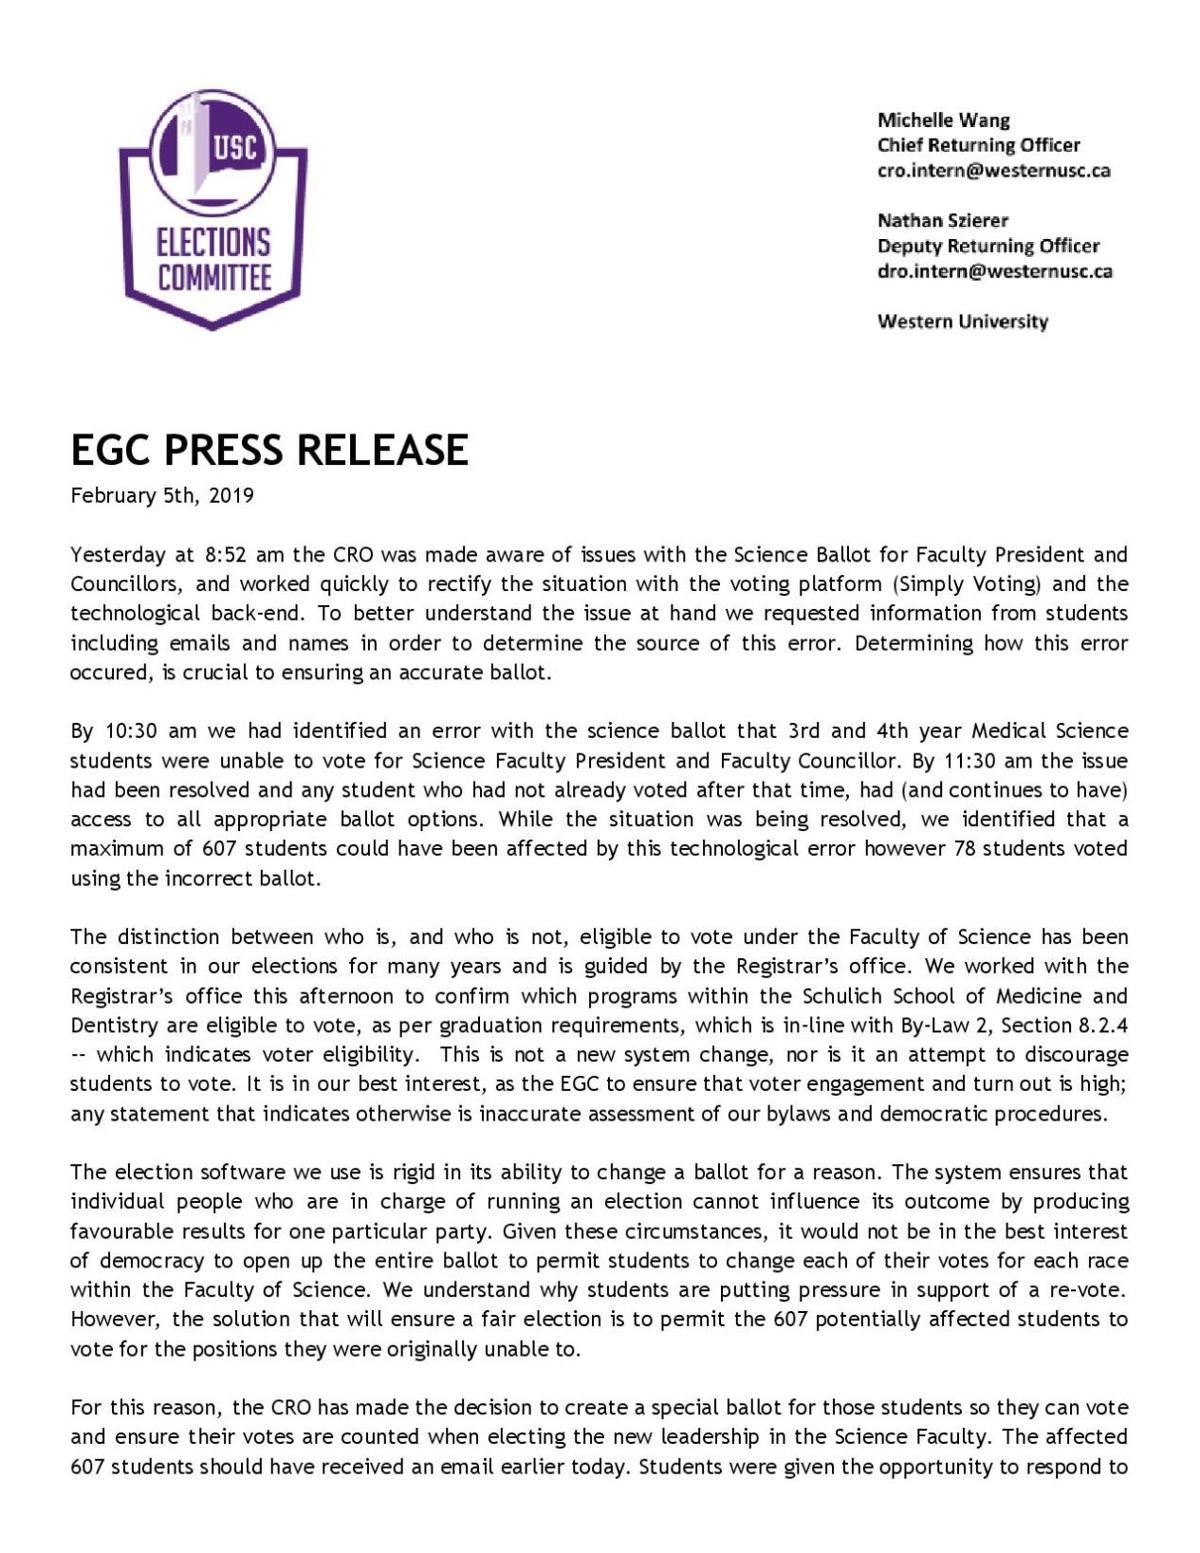 EGC response Feb.5, one